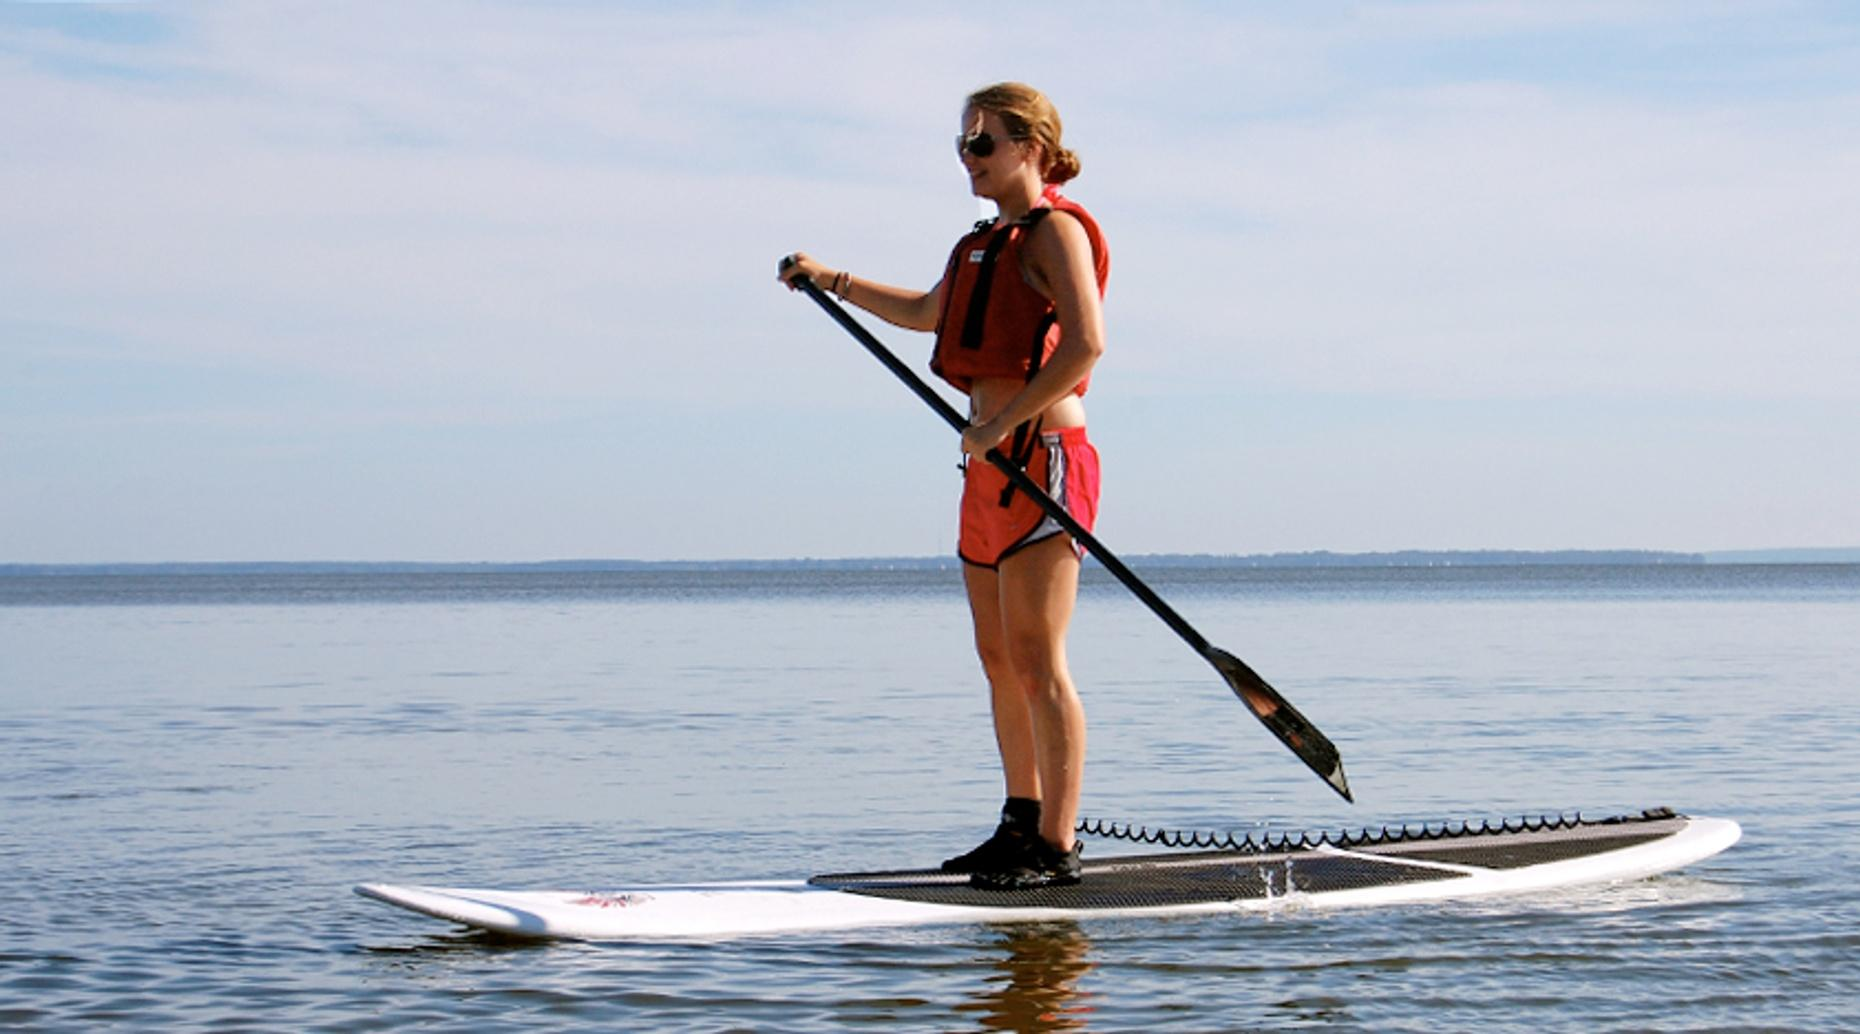 Stand Up Paddle Board Rental in San Rafael